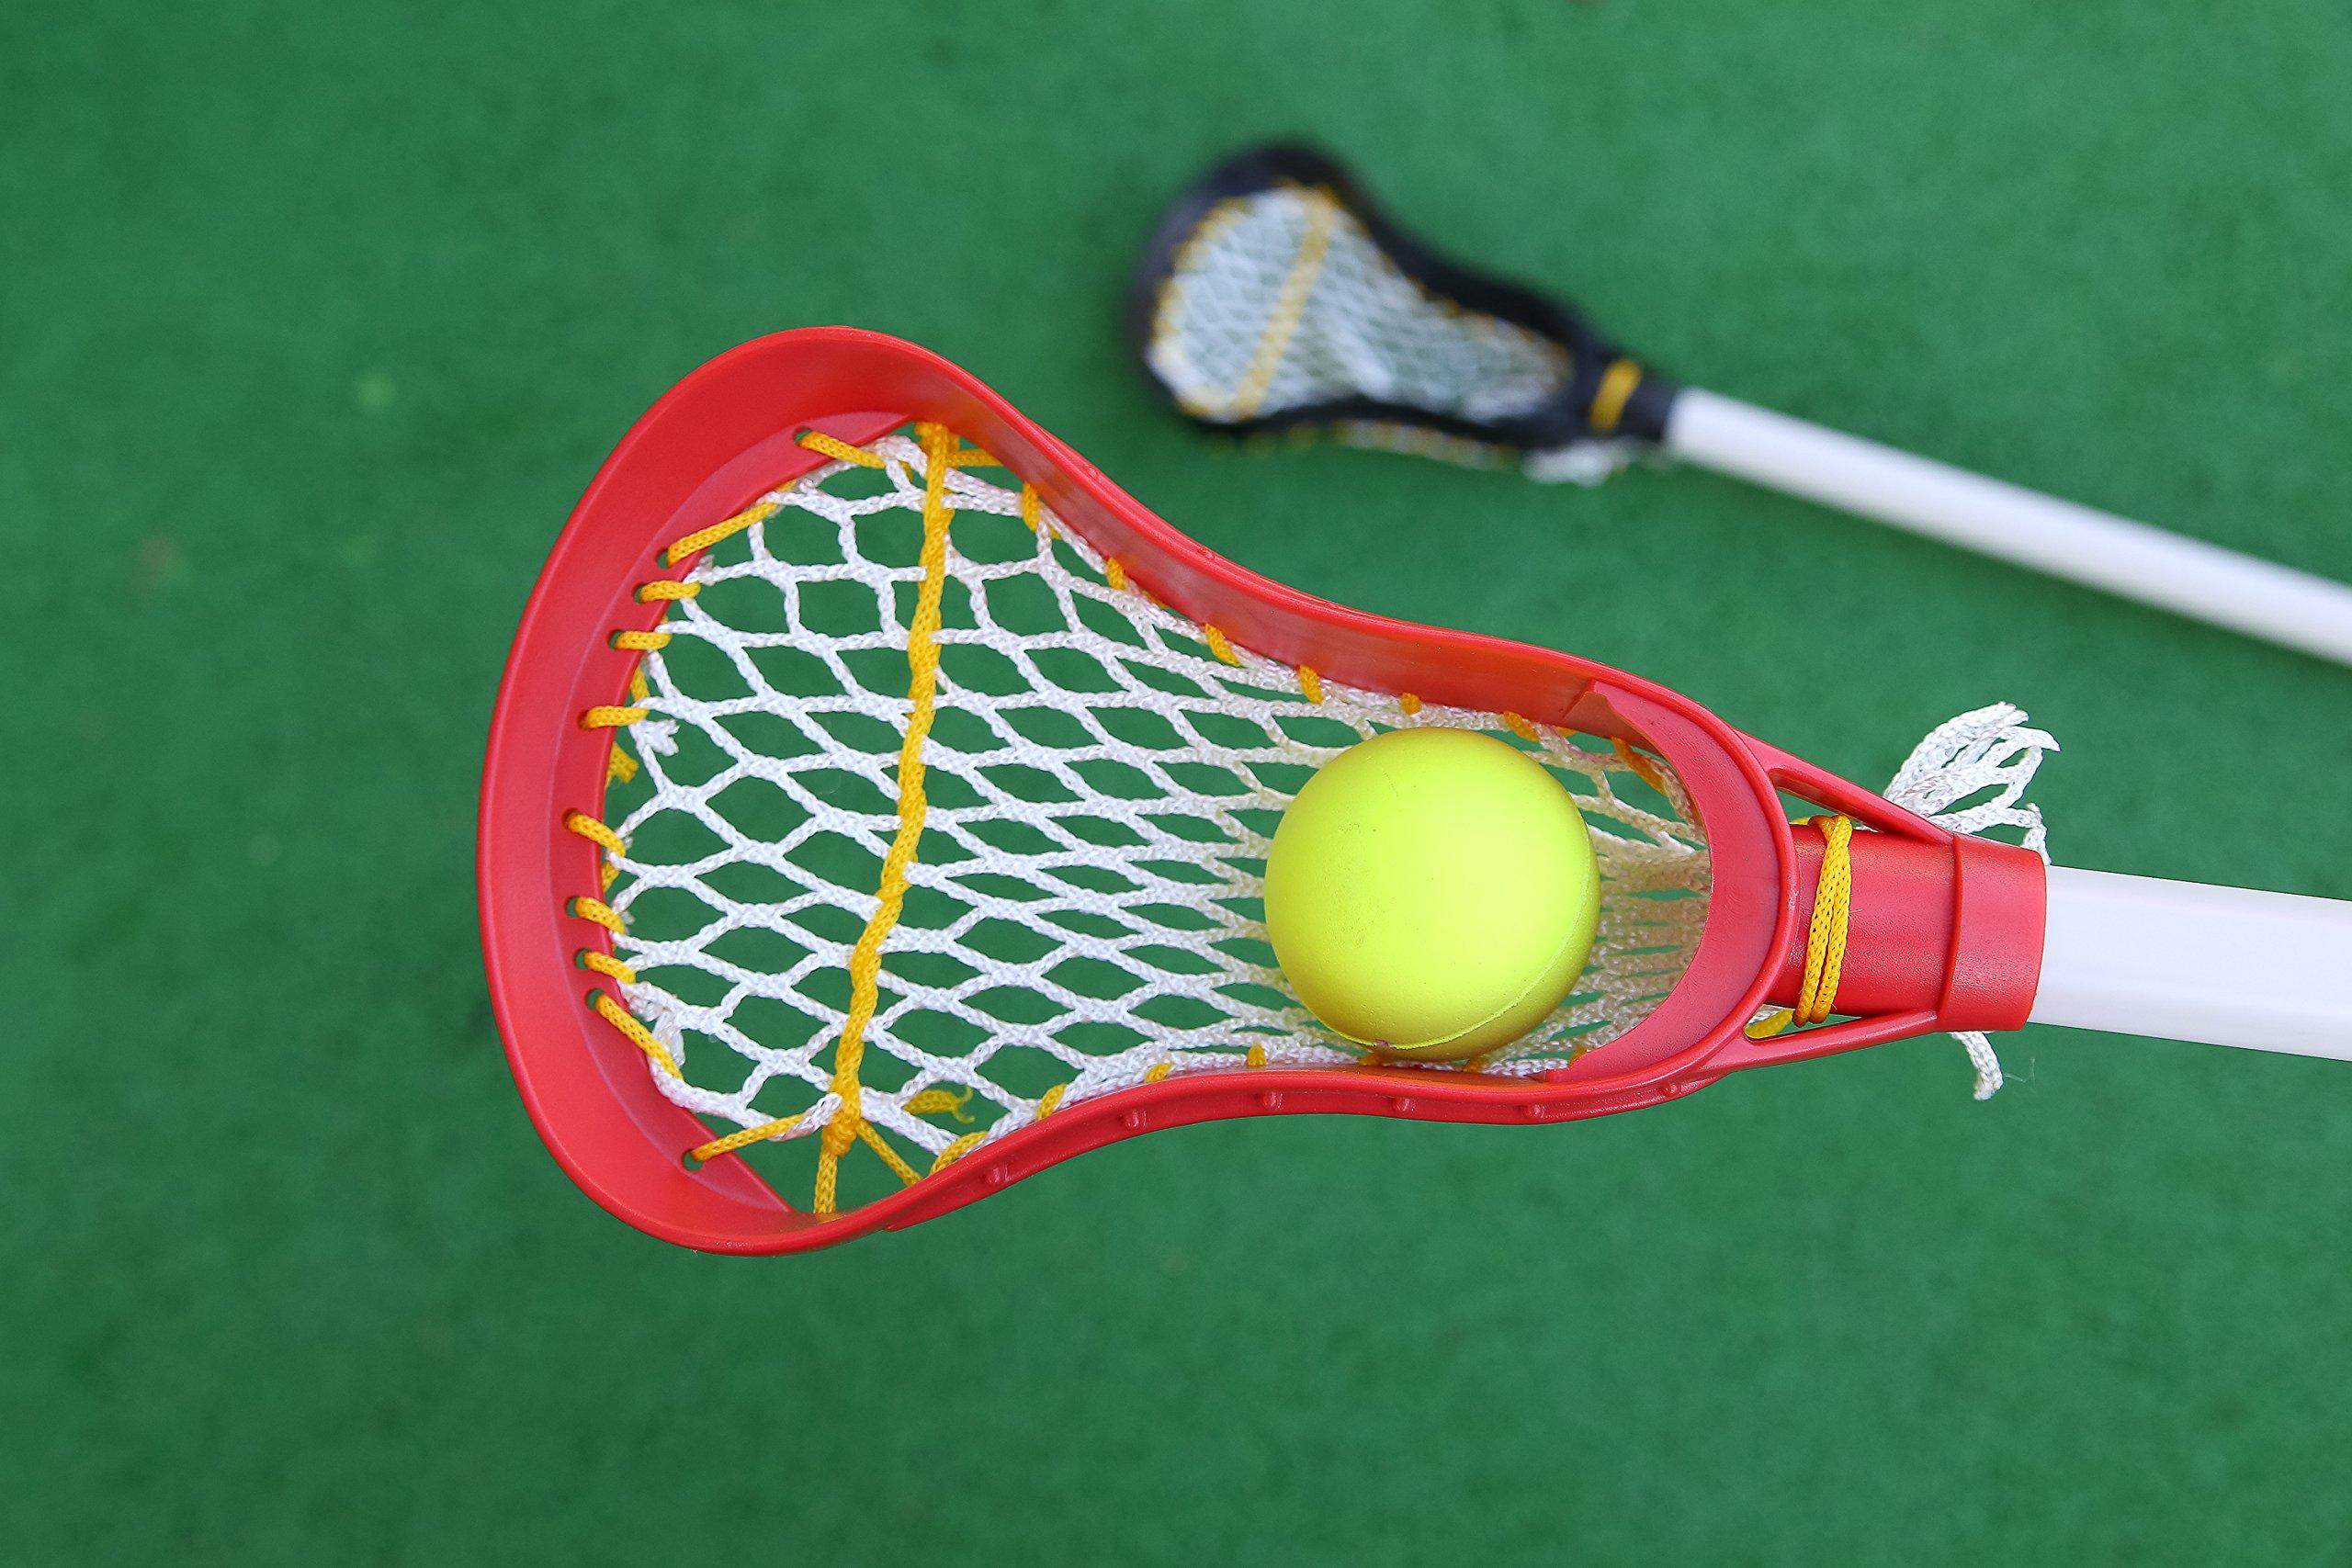 Kids Lacrosse Sticks - 2 Sticks (30 Inches) & 1 Ball - Soft Mesh Pockets, Durable Plastic Handles, & Large Head Design by Junior Lacrosse (Image #2)